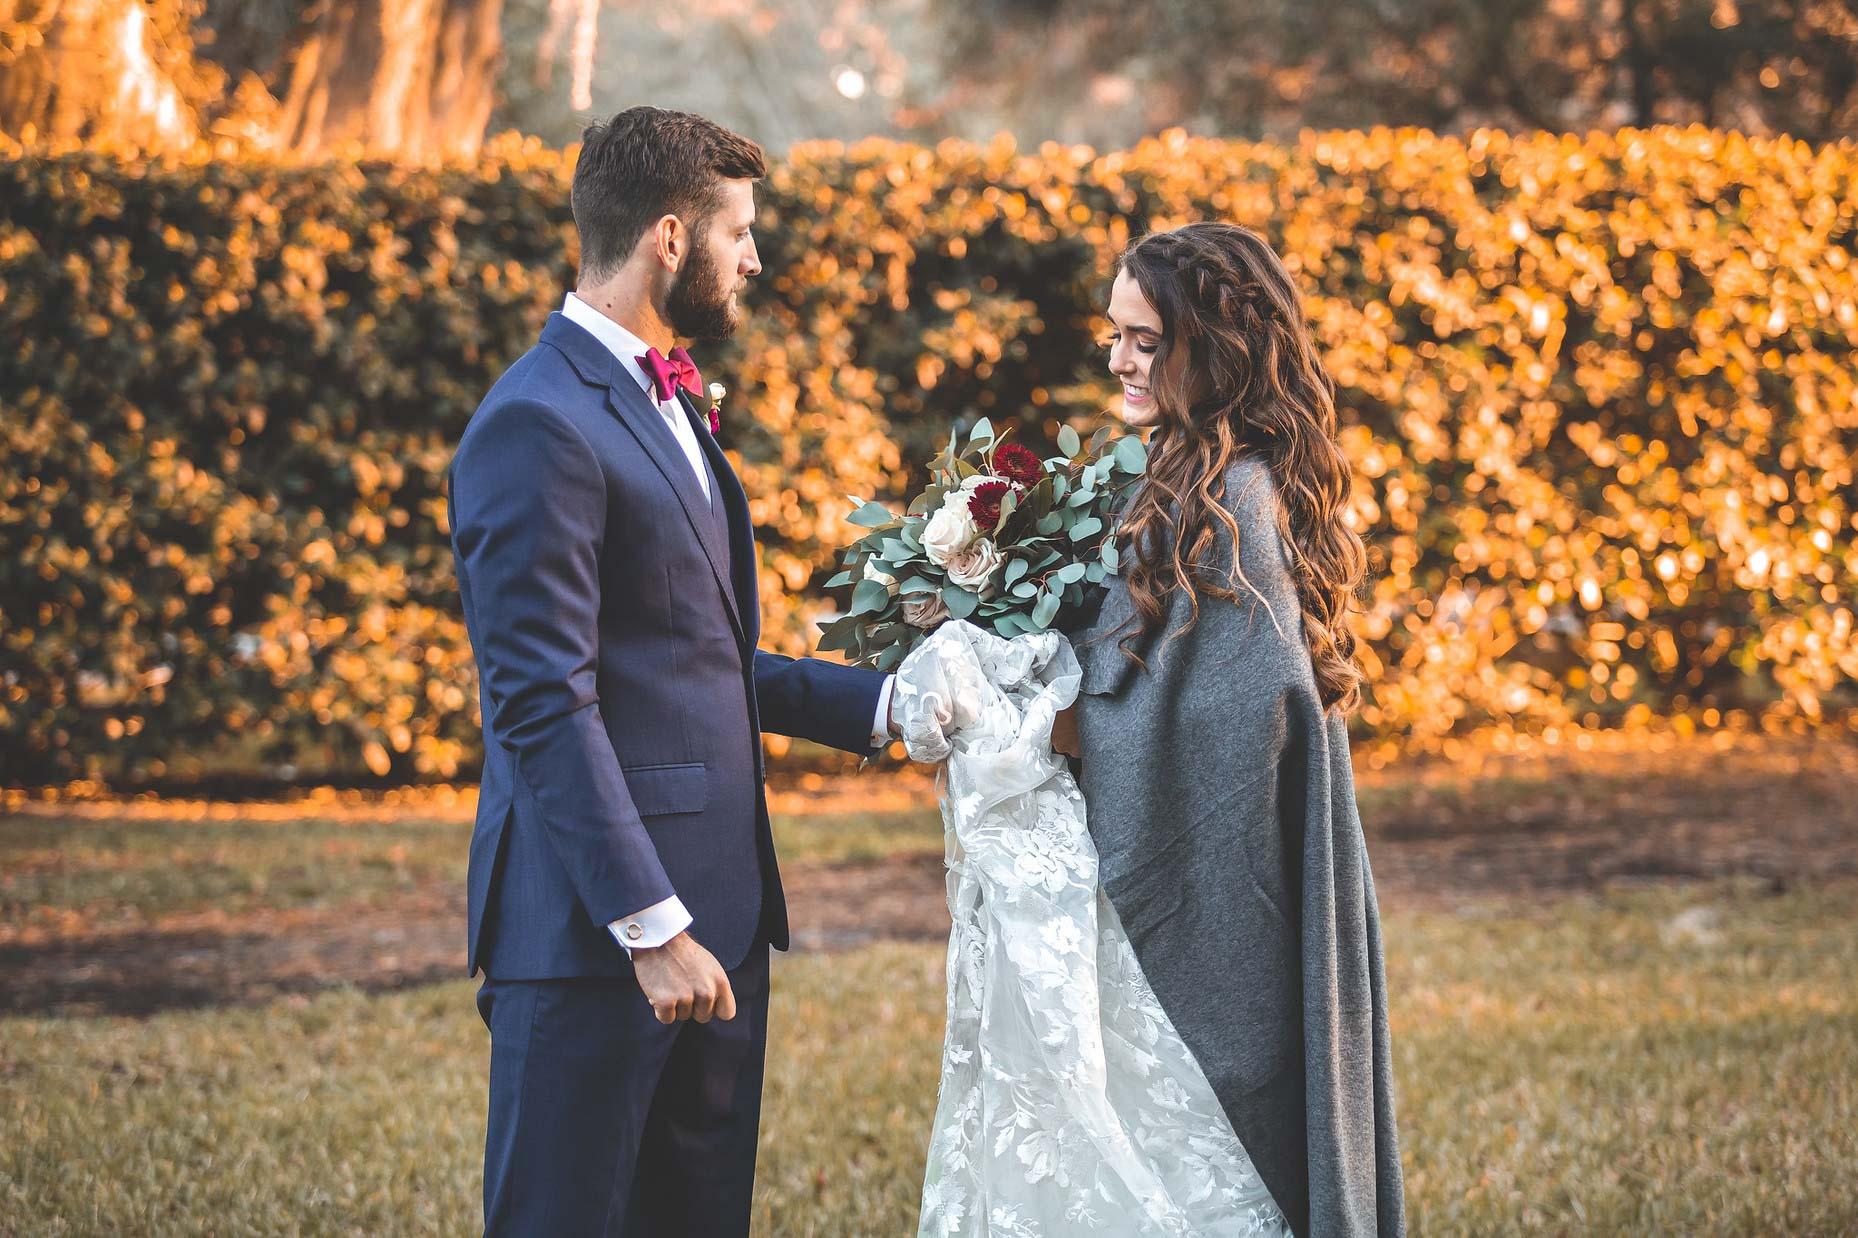 adam-szarmack-bowing-oaks-wedding-photographer-jacksonville-16.jpg